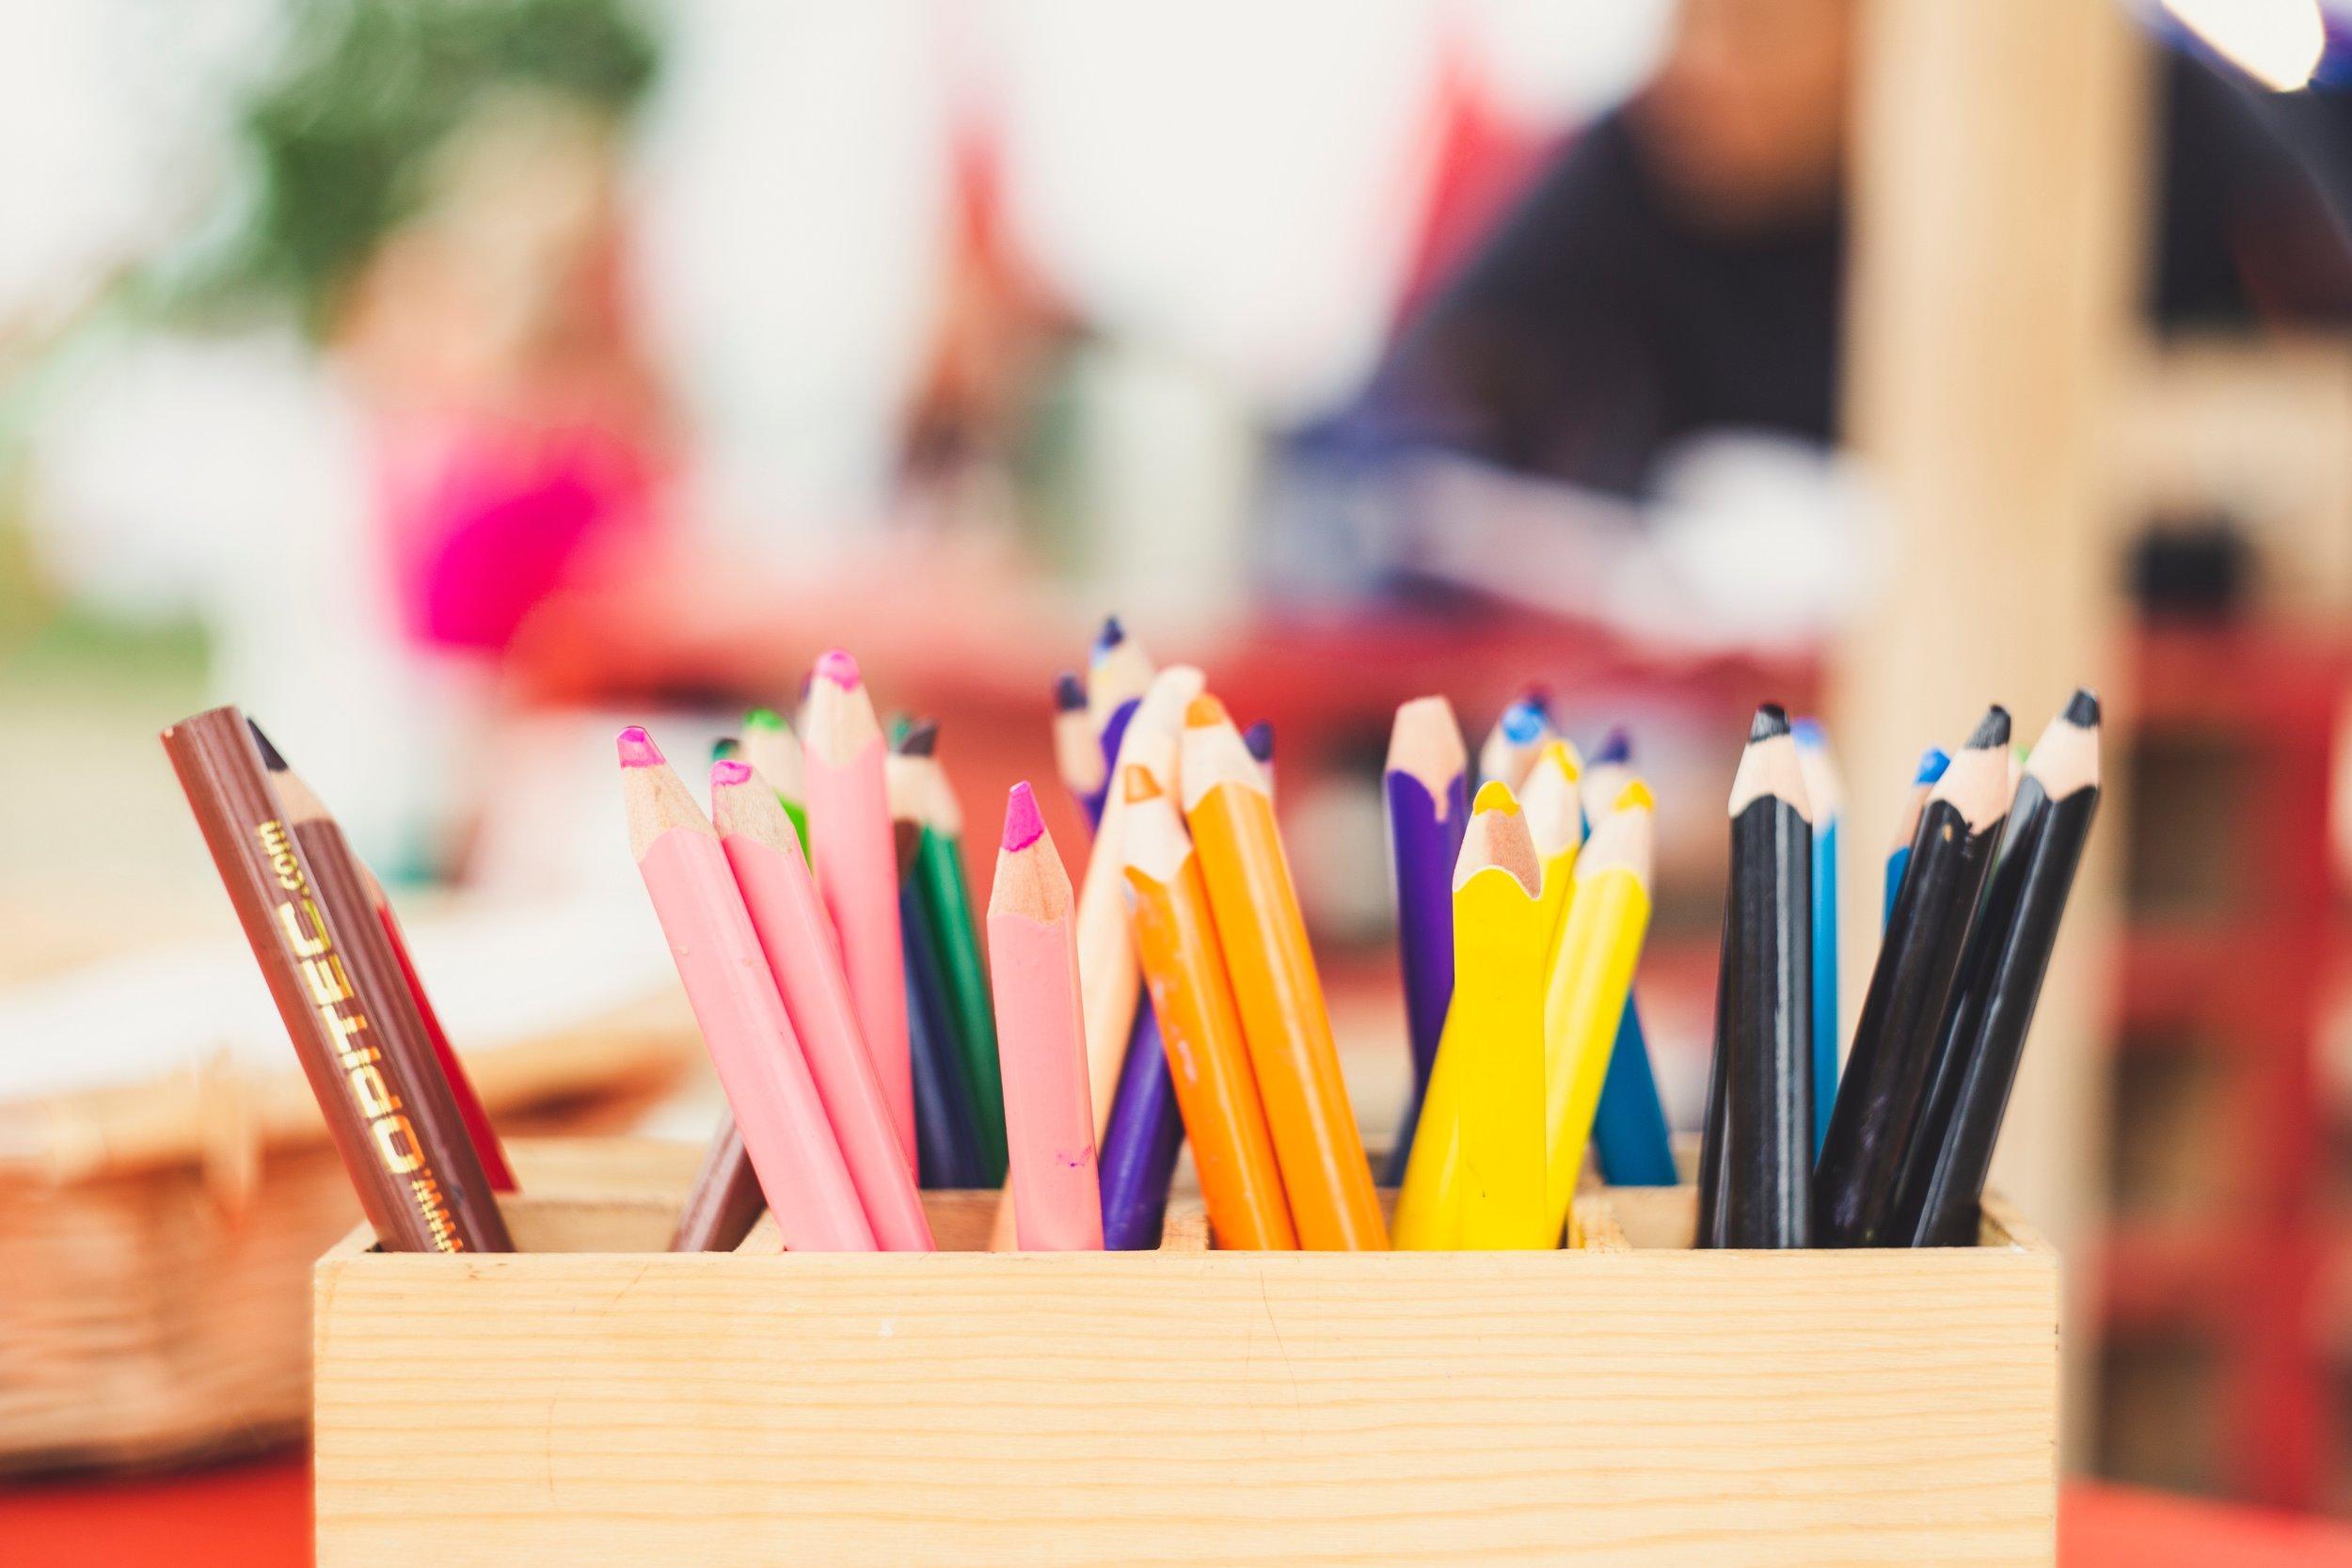 coloring pencils.jpg